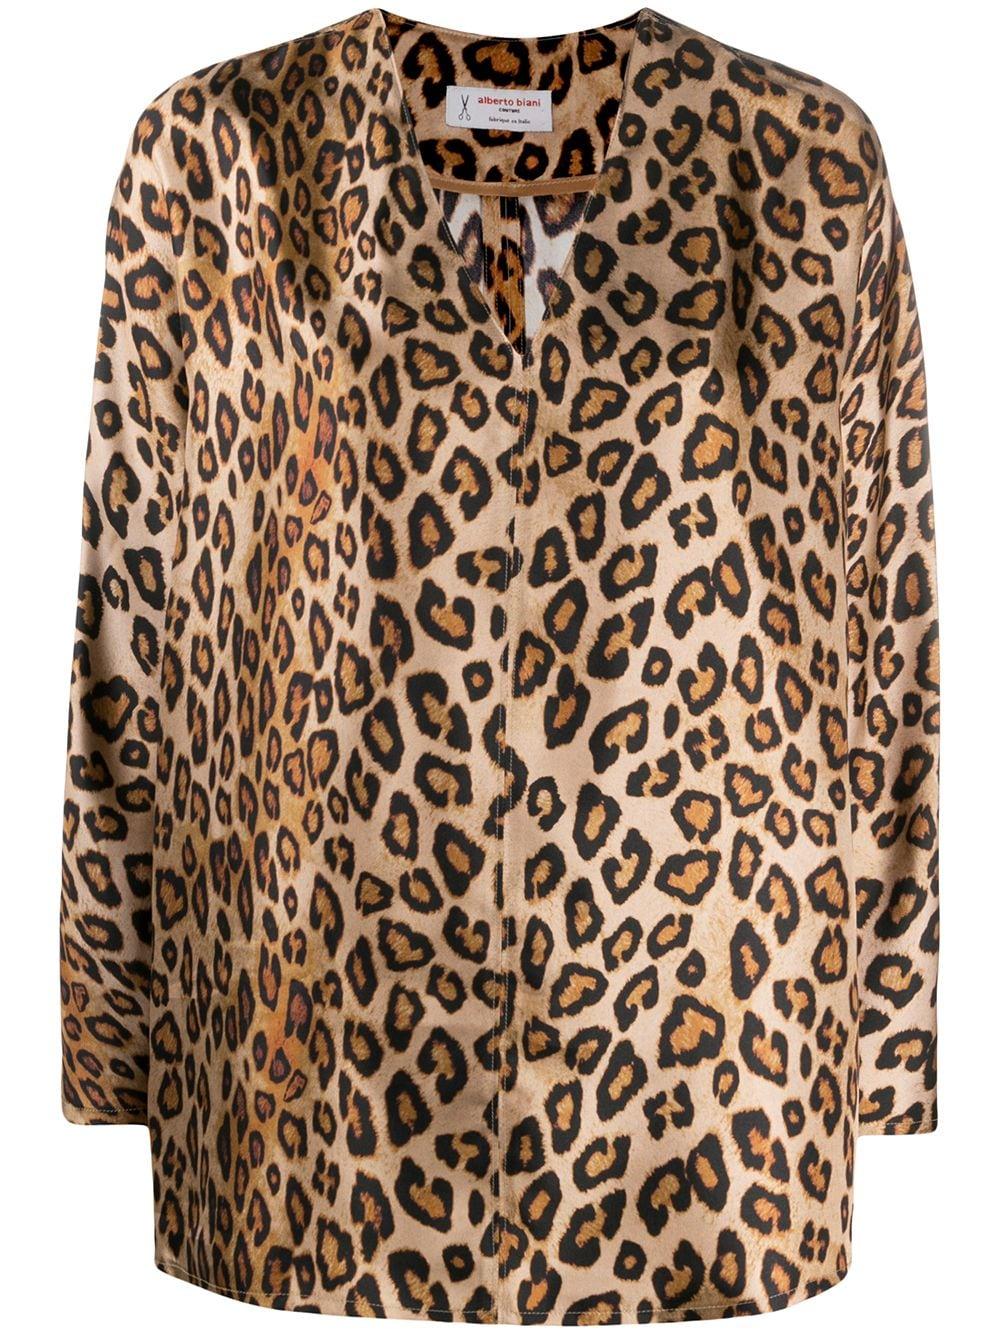 Beige and brown leopard-print silk blouse ALBERTO BIANI |  | MM808-SE310660